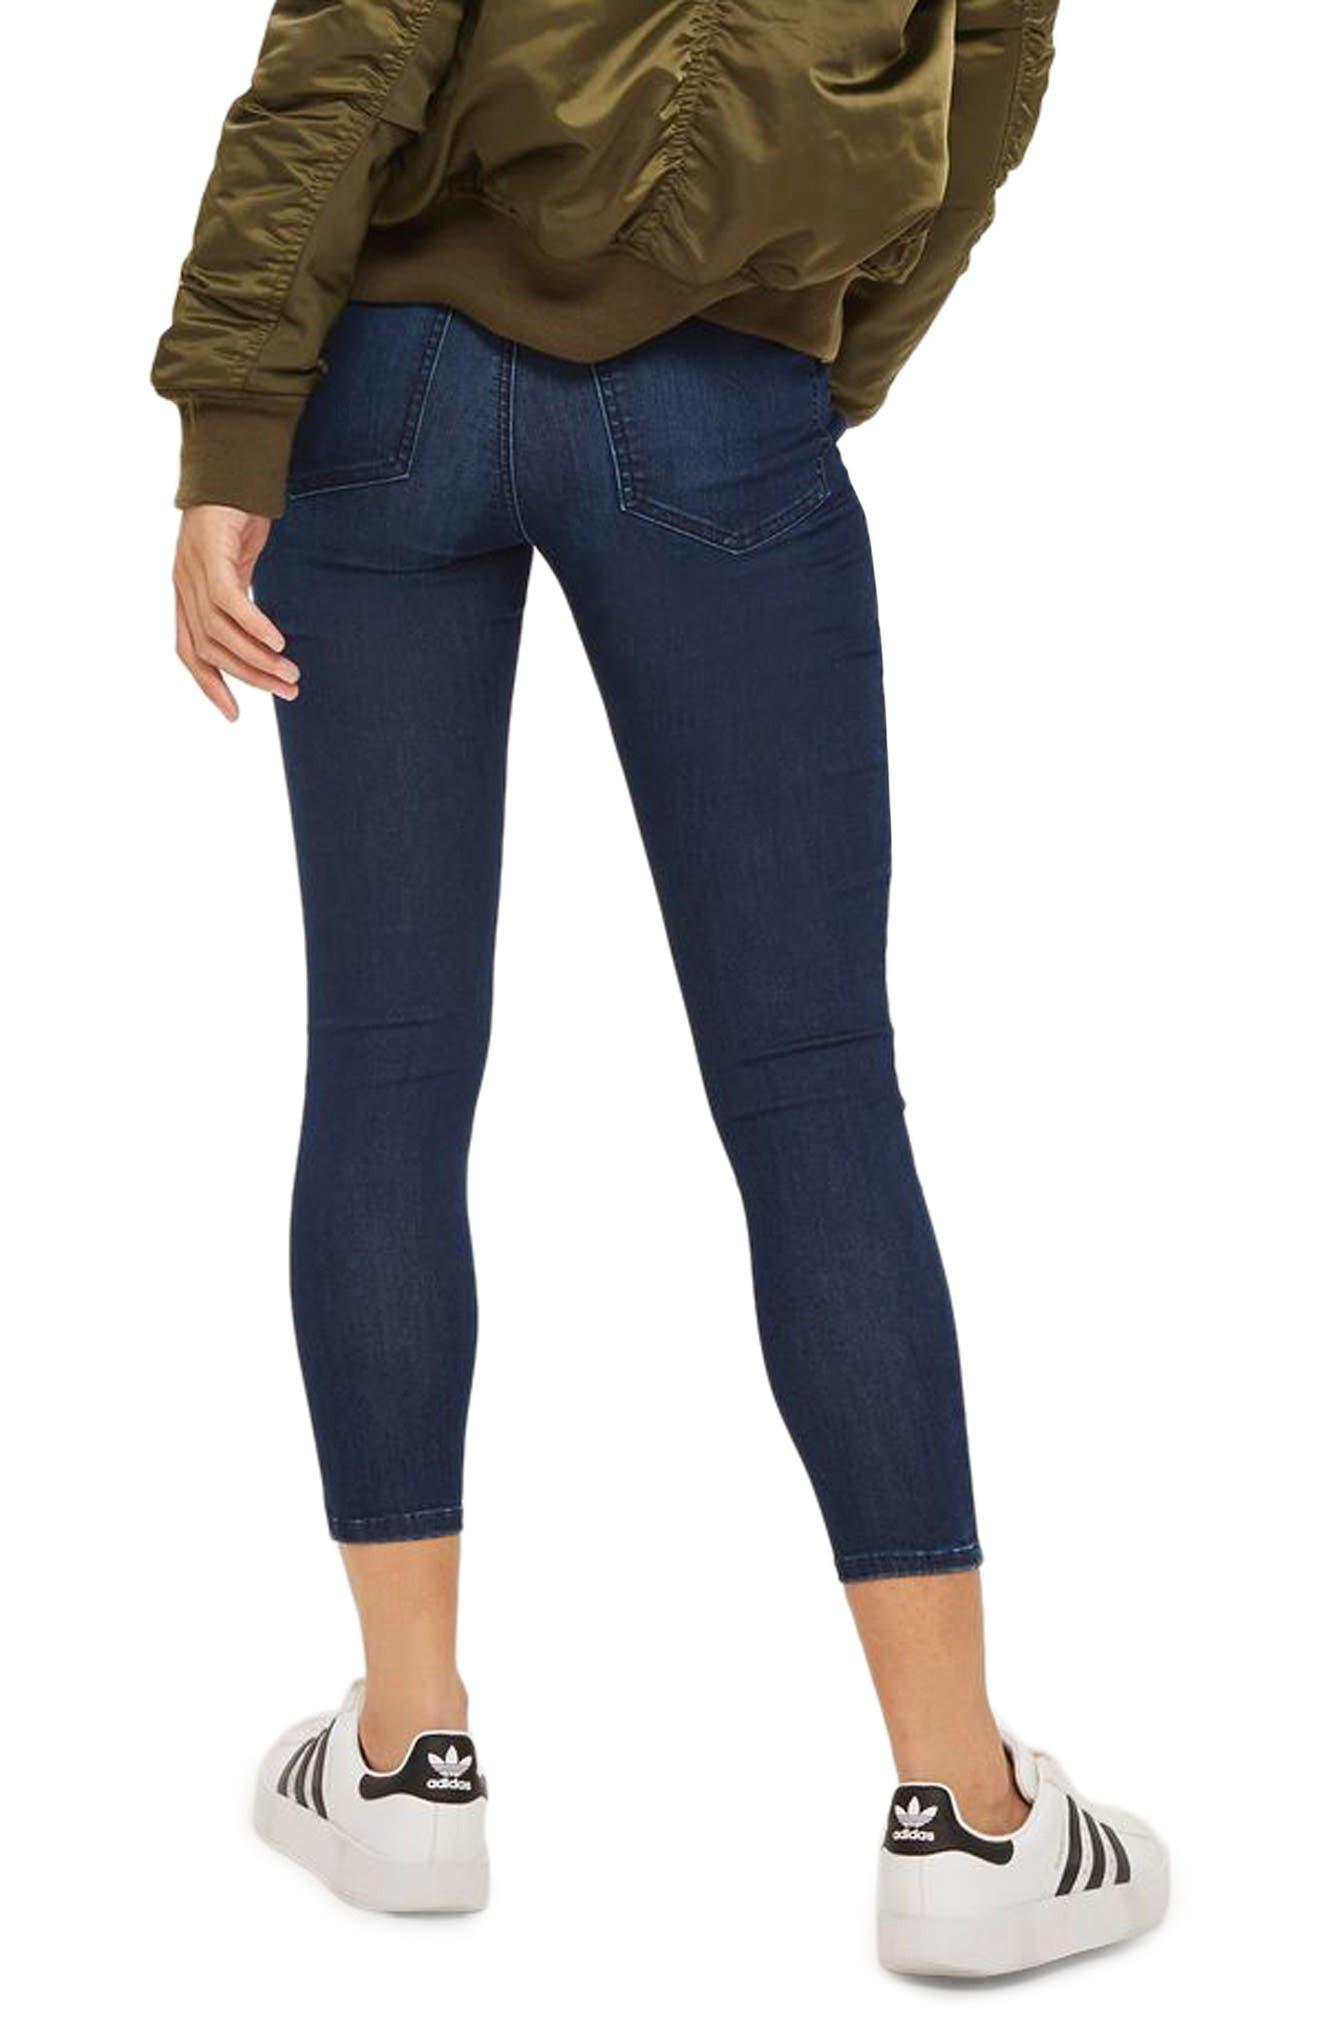 Joni High Waist Skinny Jeans,                             Alternate thumbnail 2, color,                             401